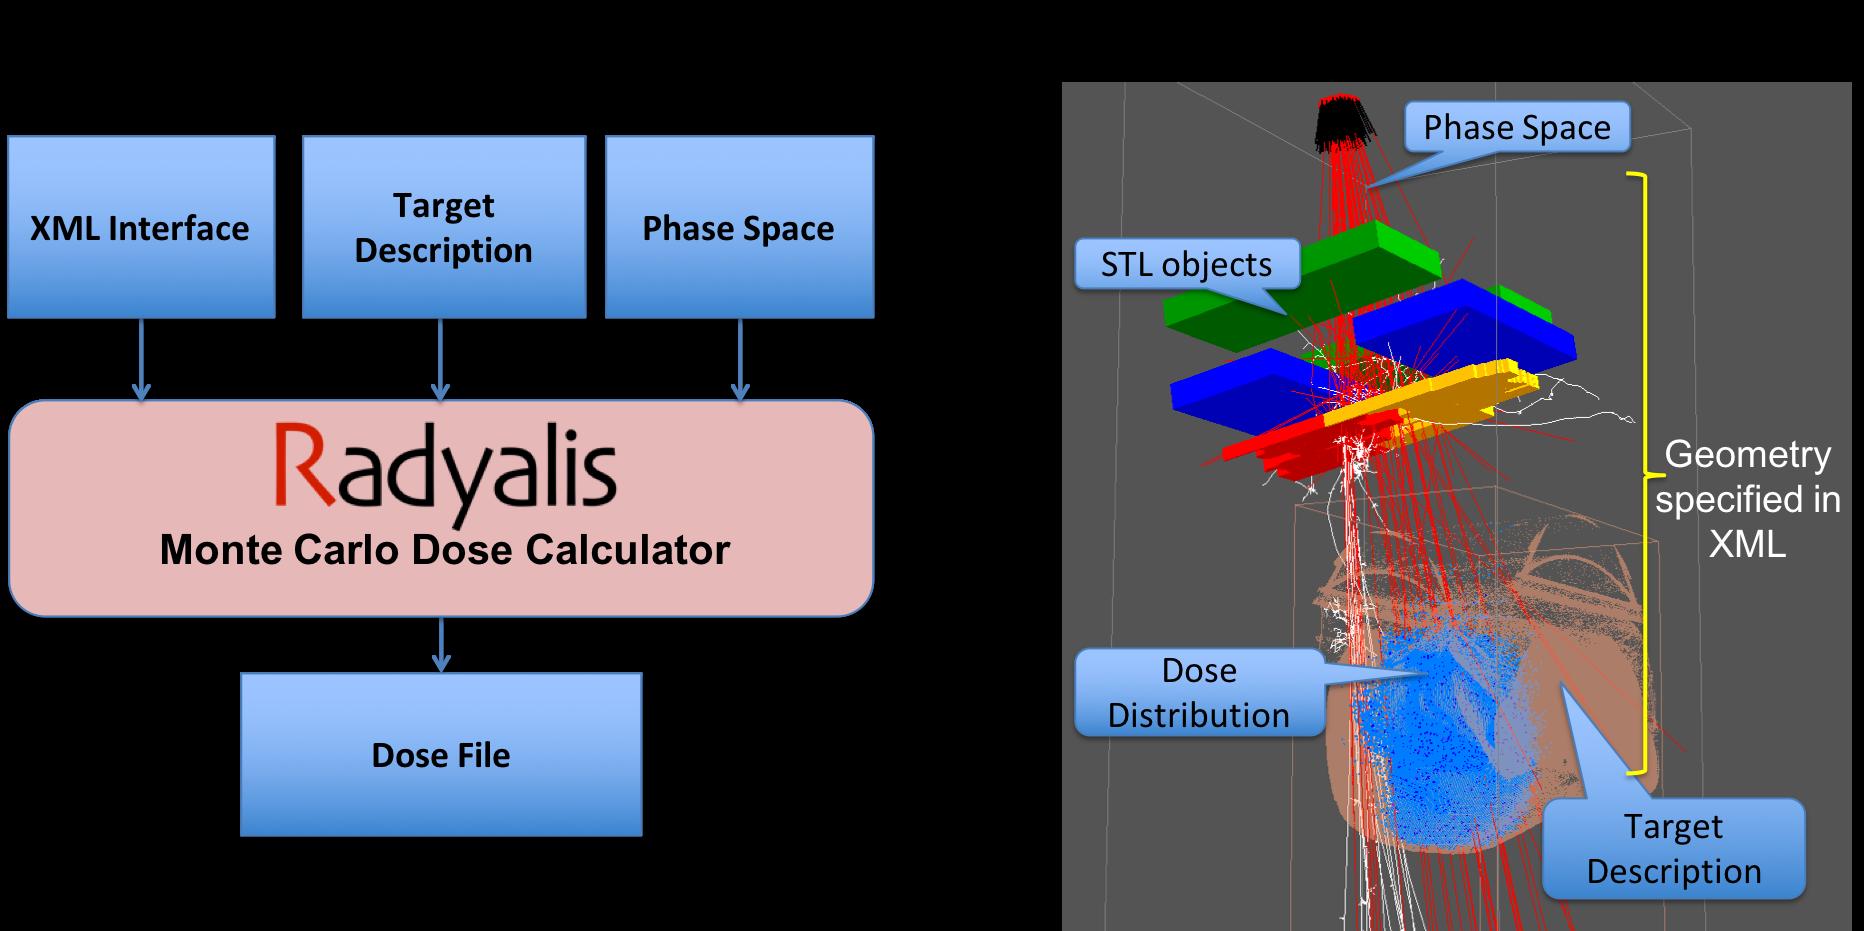 Radyalis Monte Carlo Dose Calculator and Simulation Example